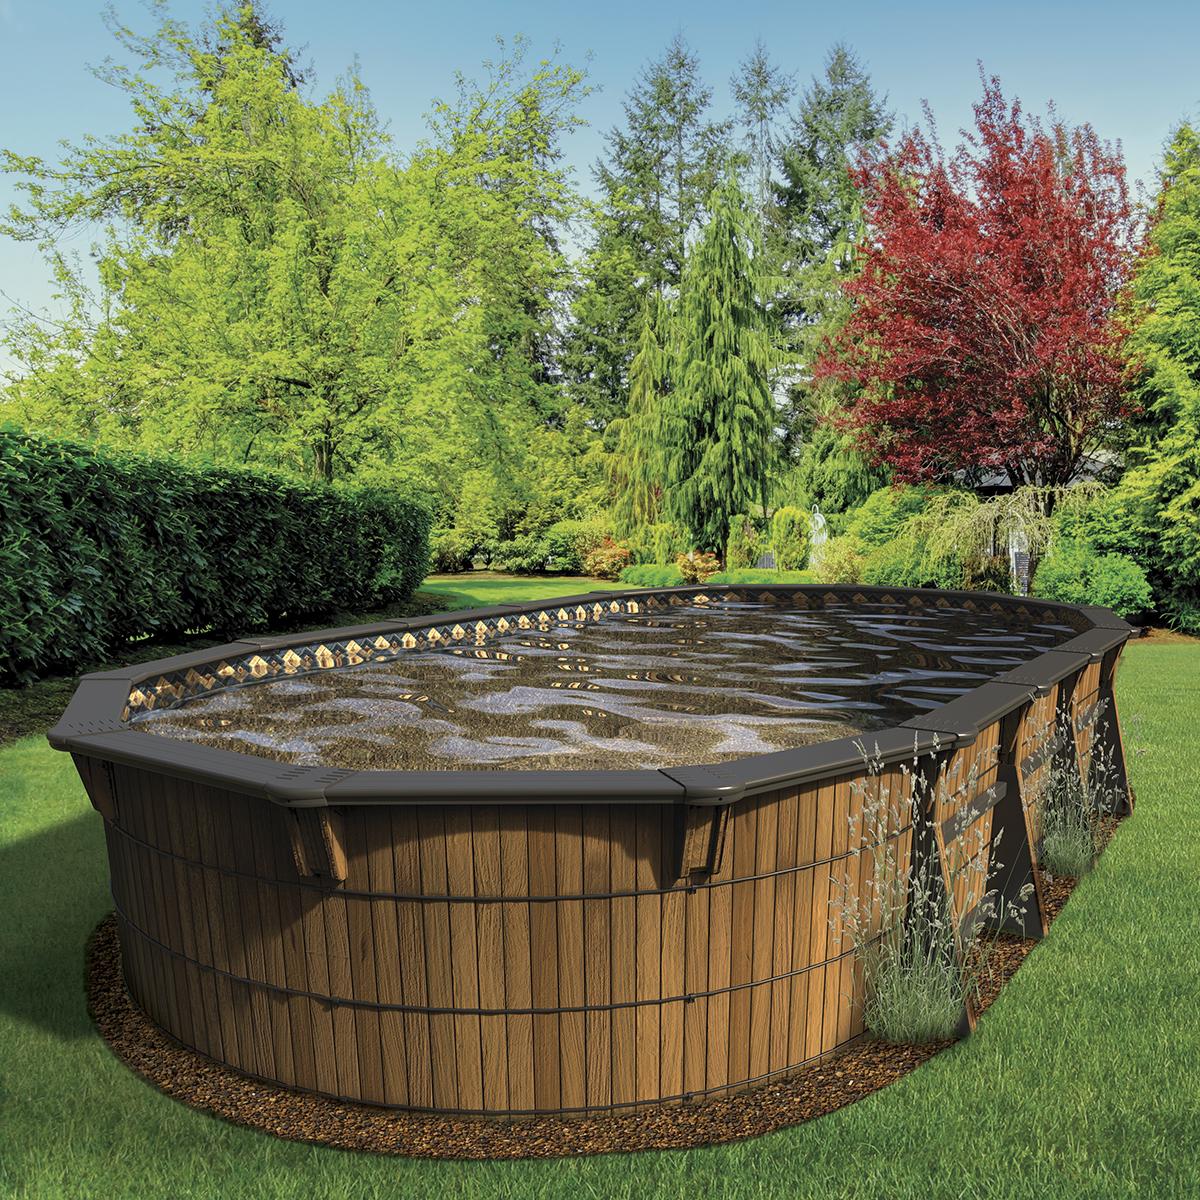 Piscine hors terre savanna concept piscine design for Piscine design concept